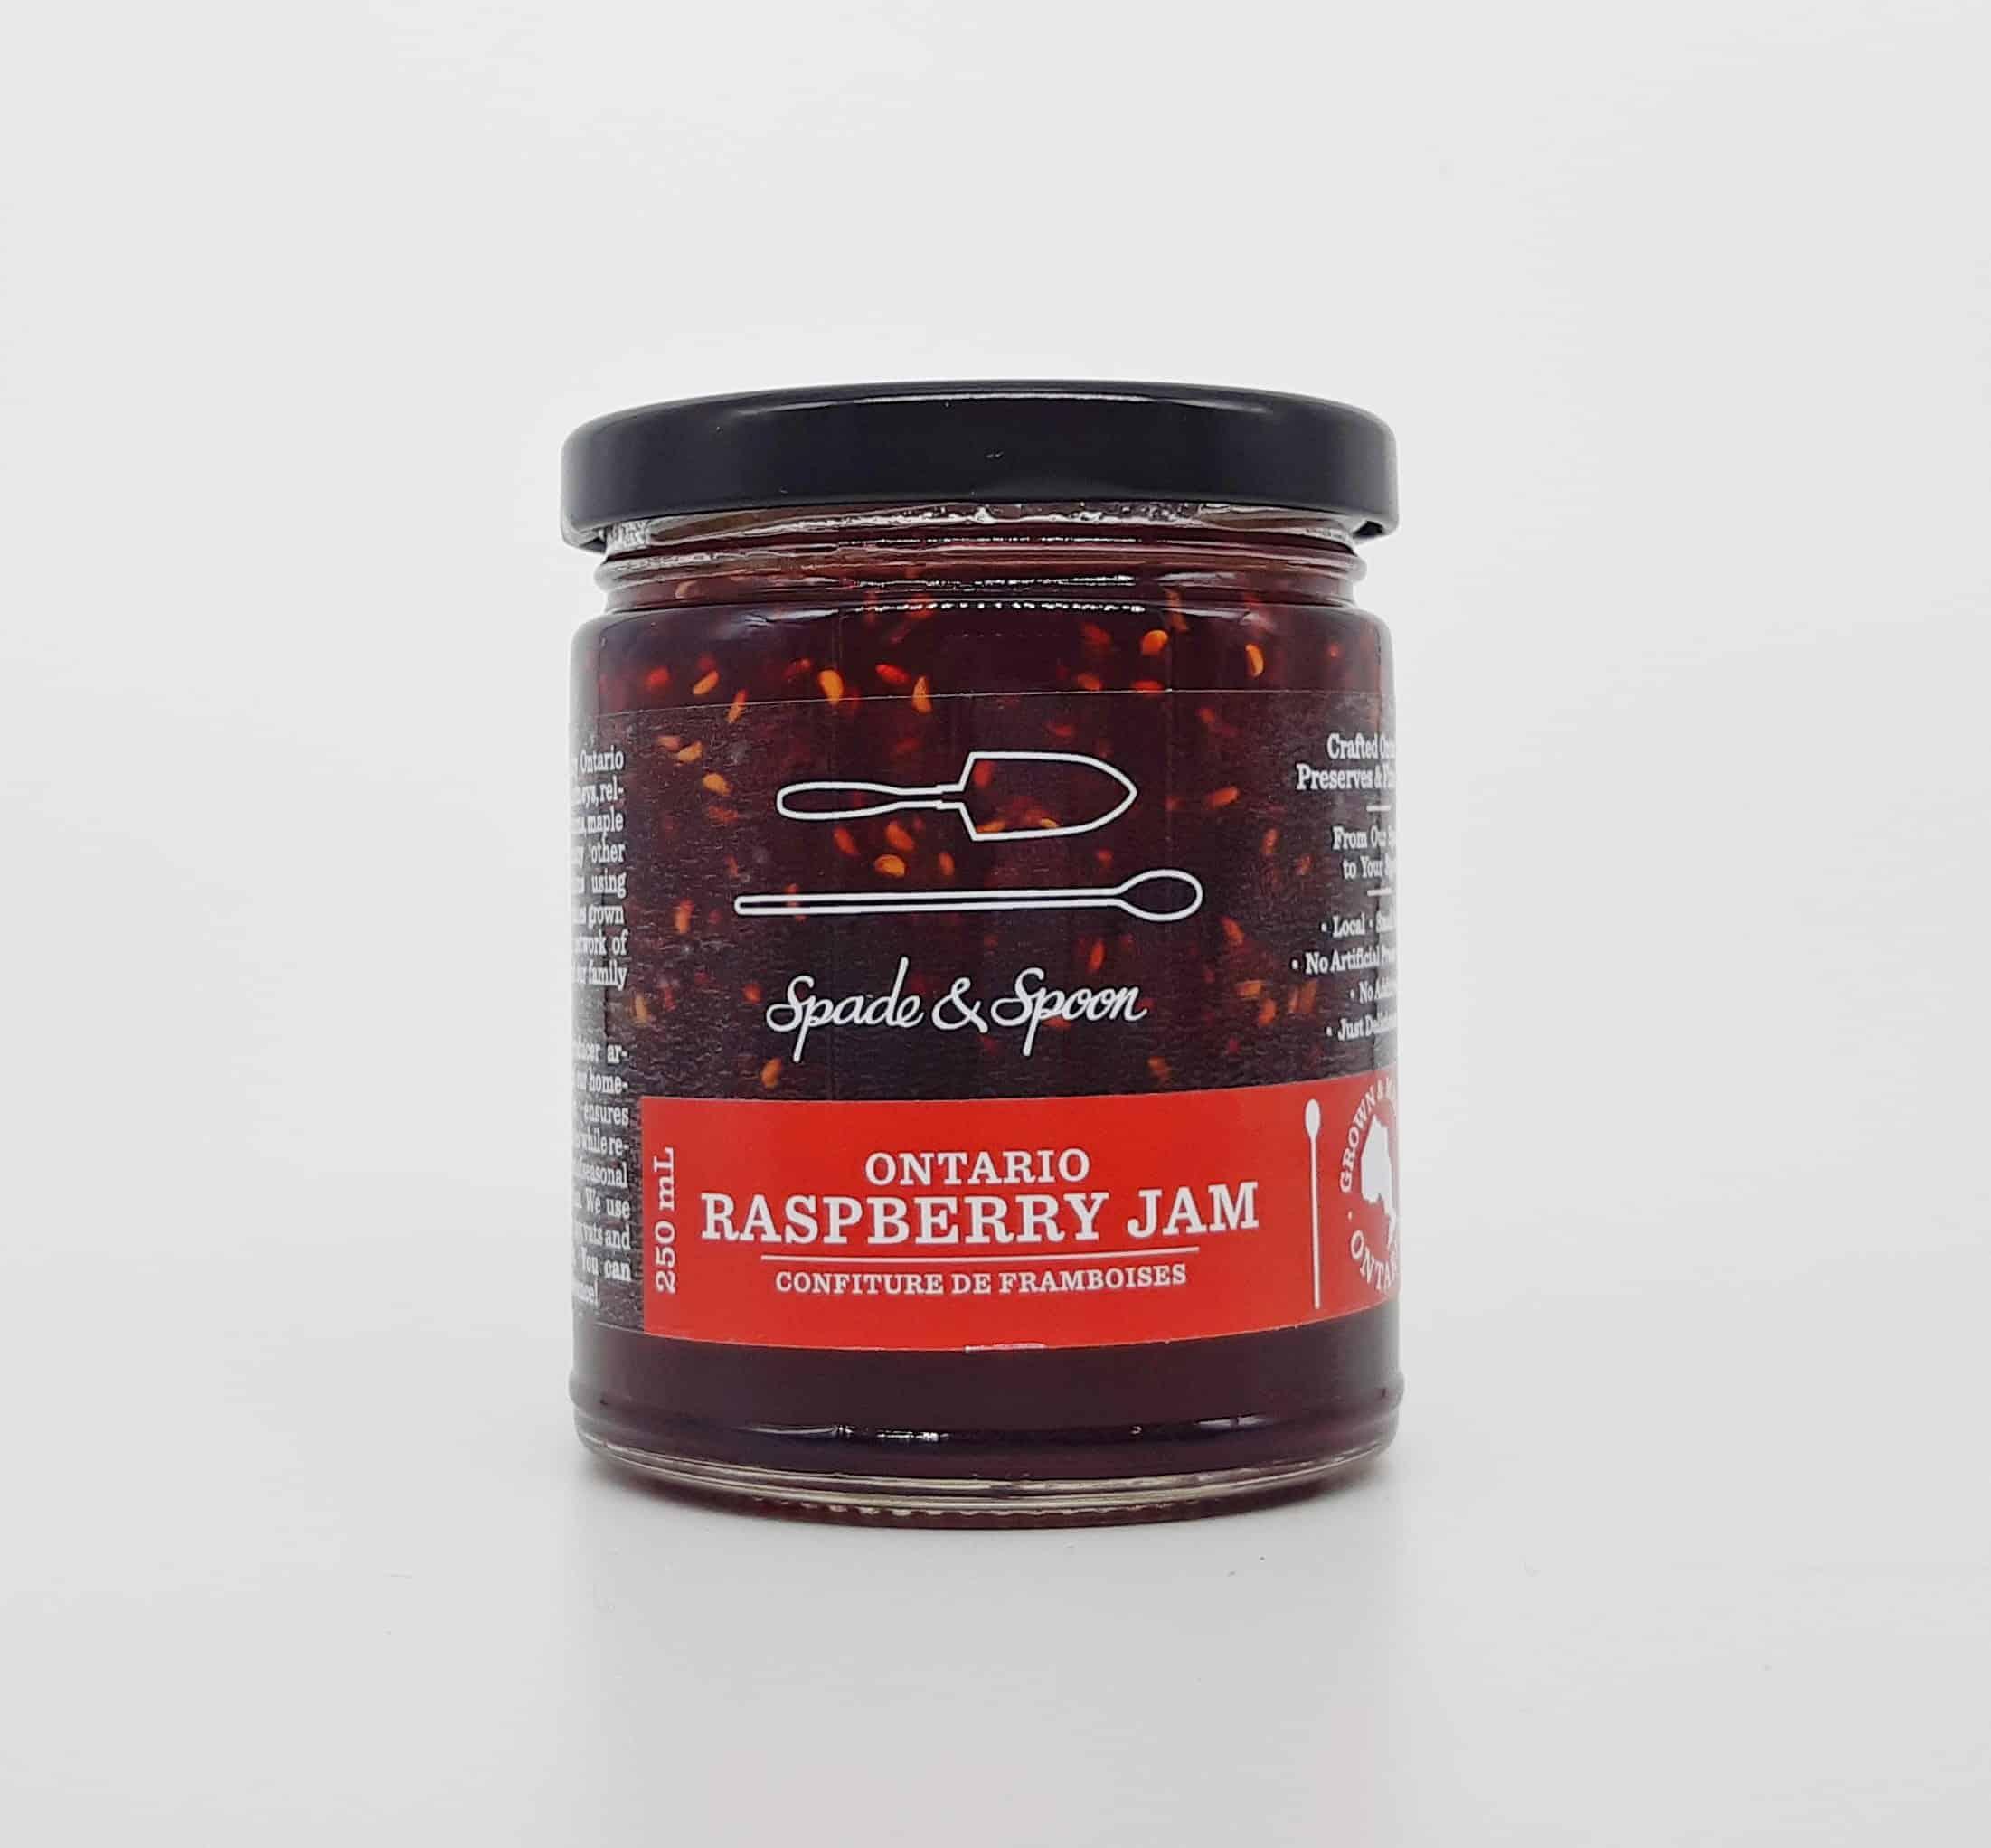 Ontario Raspberry Jam